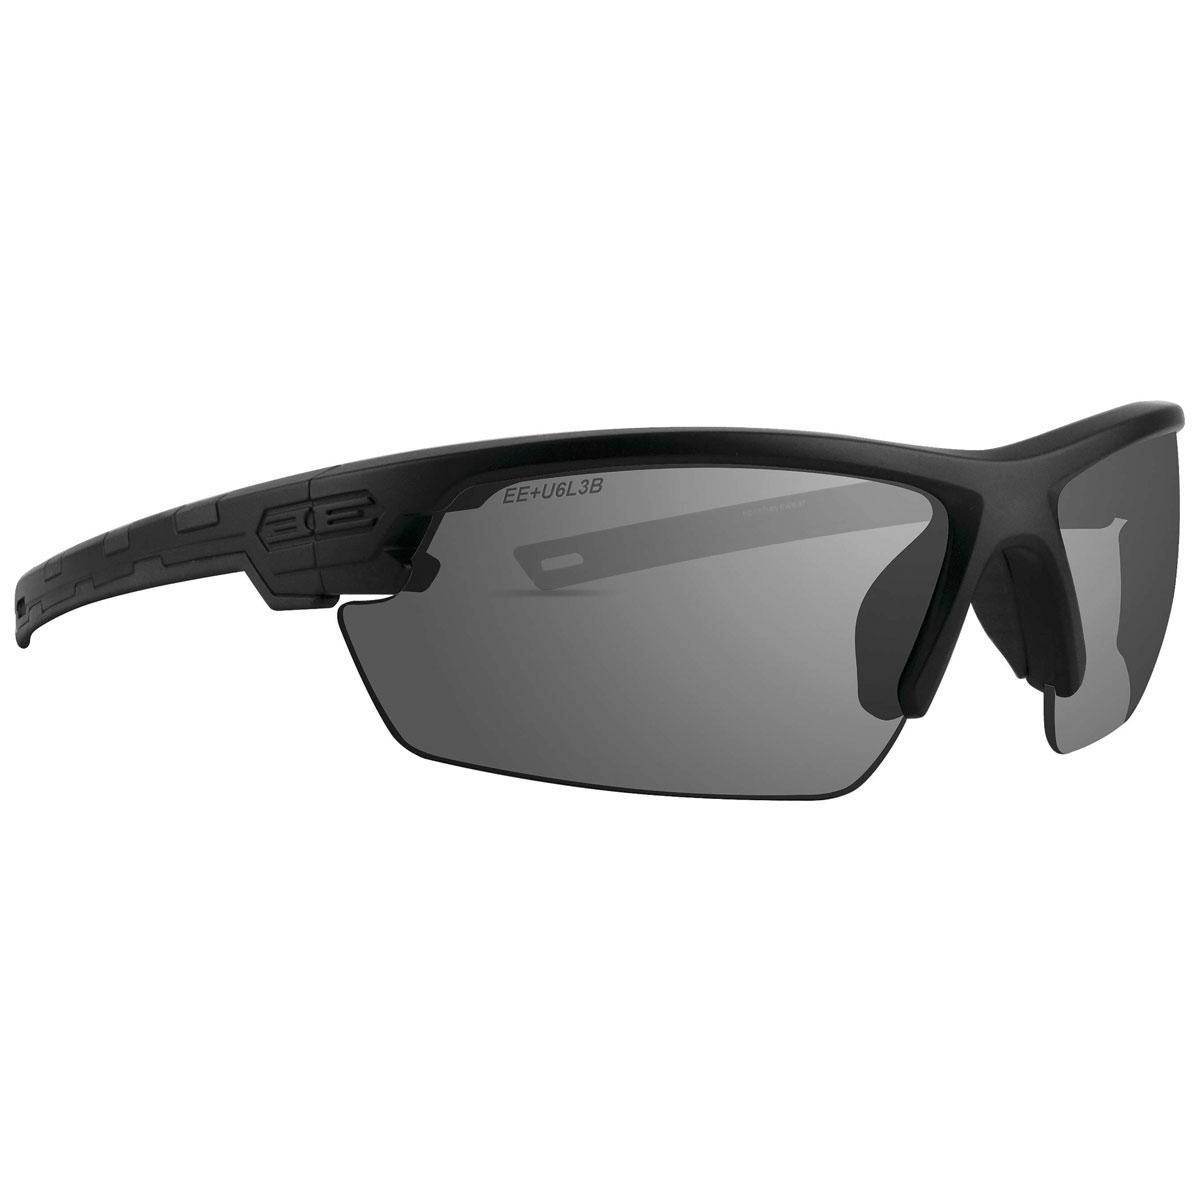 Epoch Eyewear Link Sunglasses with Smoke Lens